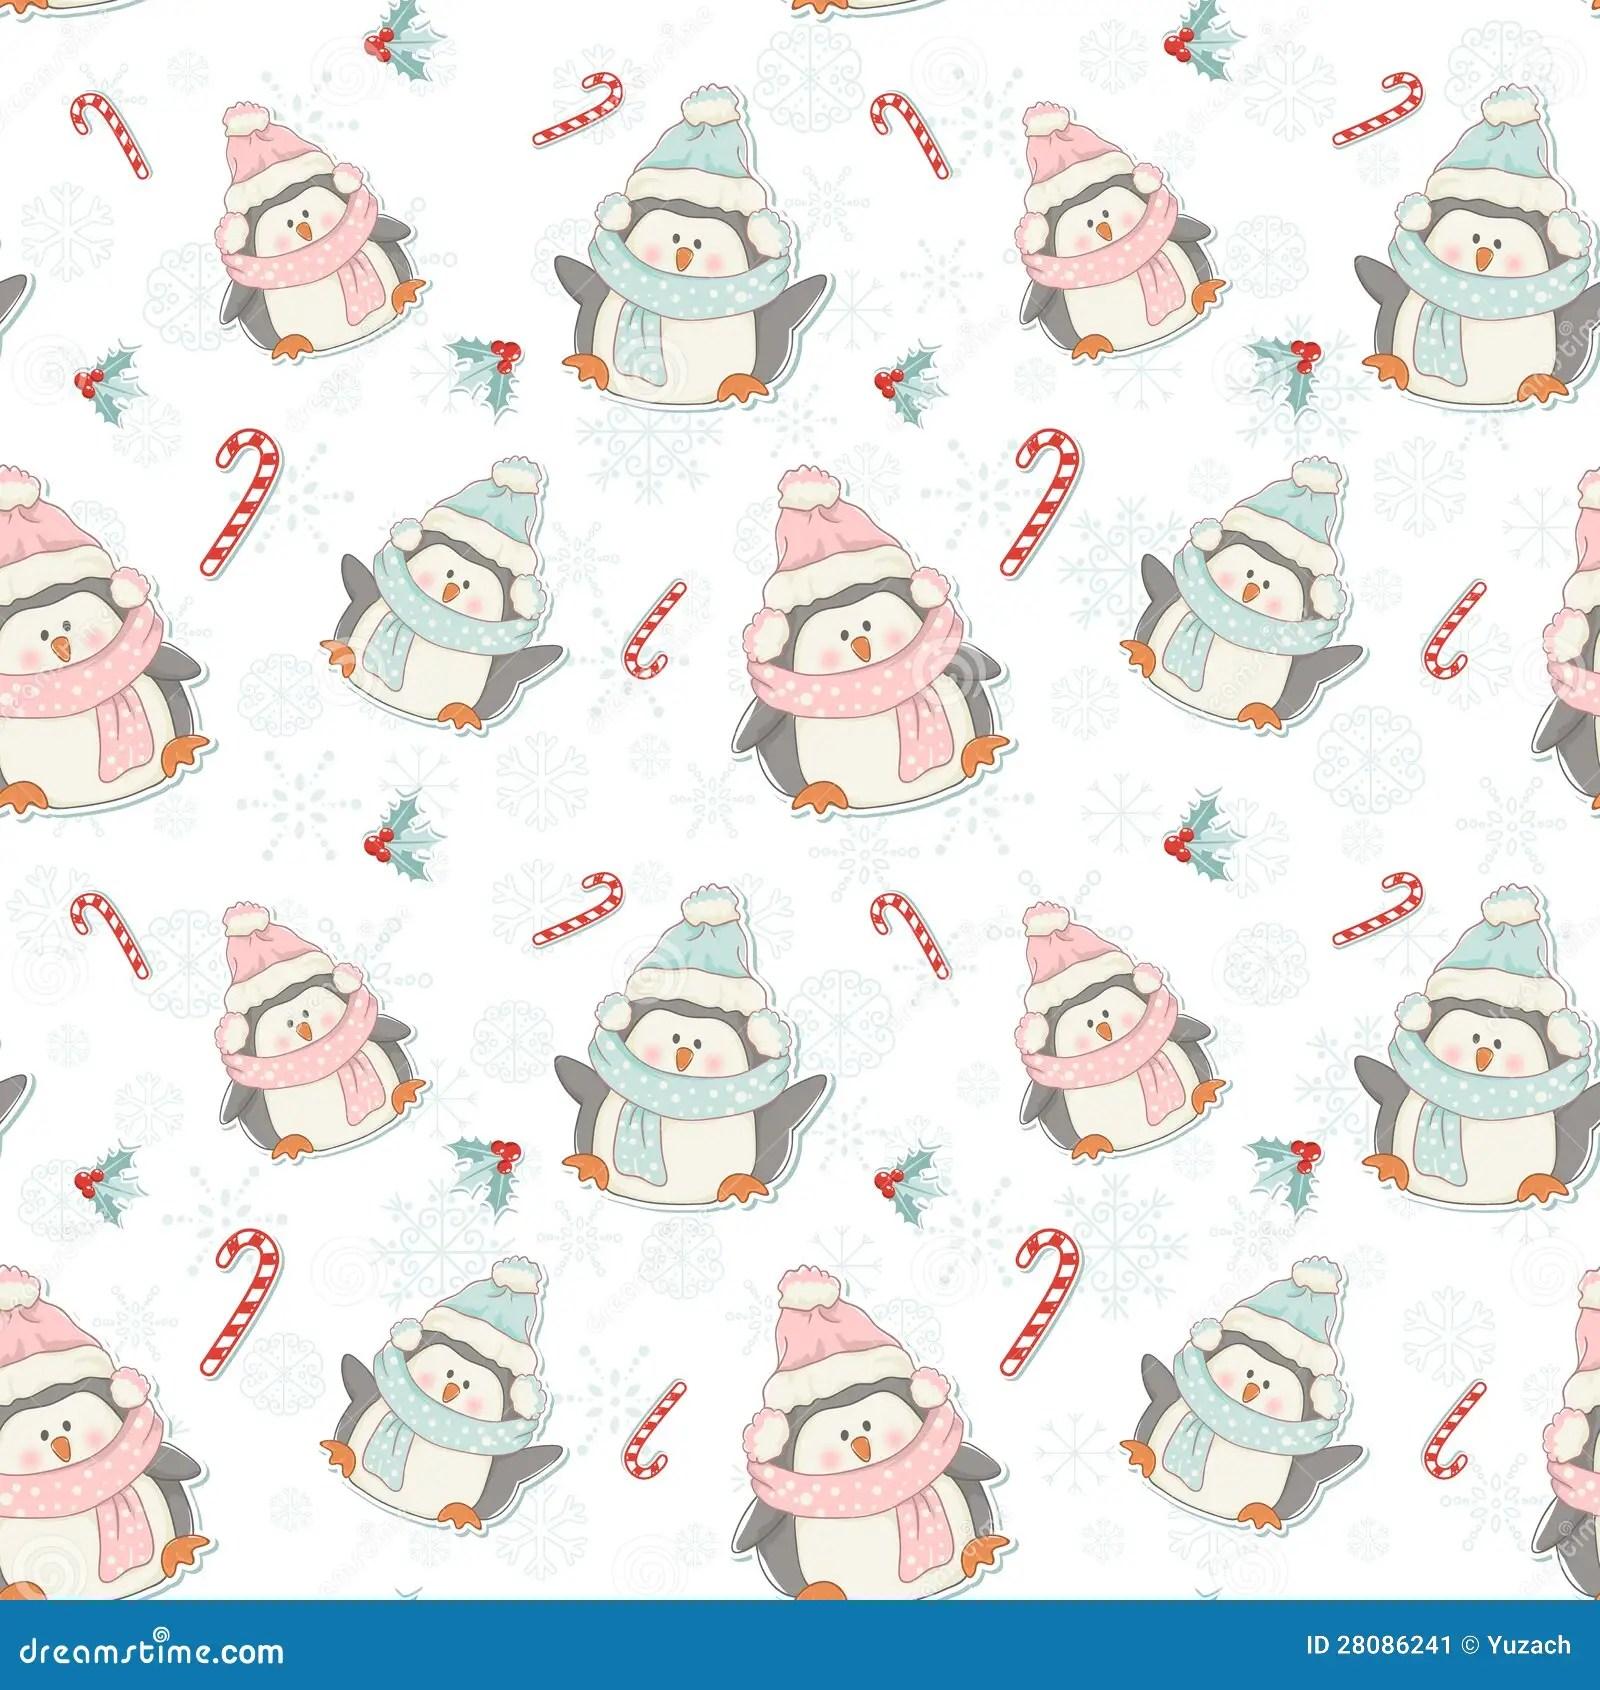 Cute Cartoon Penguins Wallpaper Cute Christmas Penguins Seamless Pattern Stock Vector